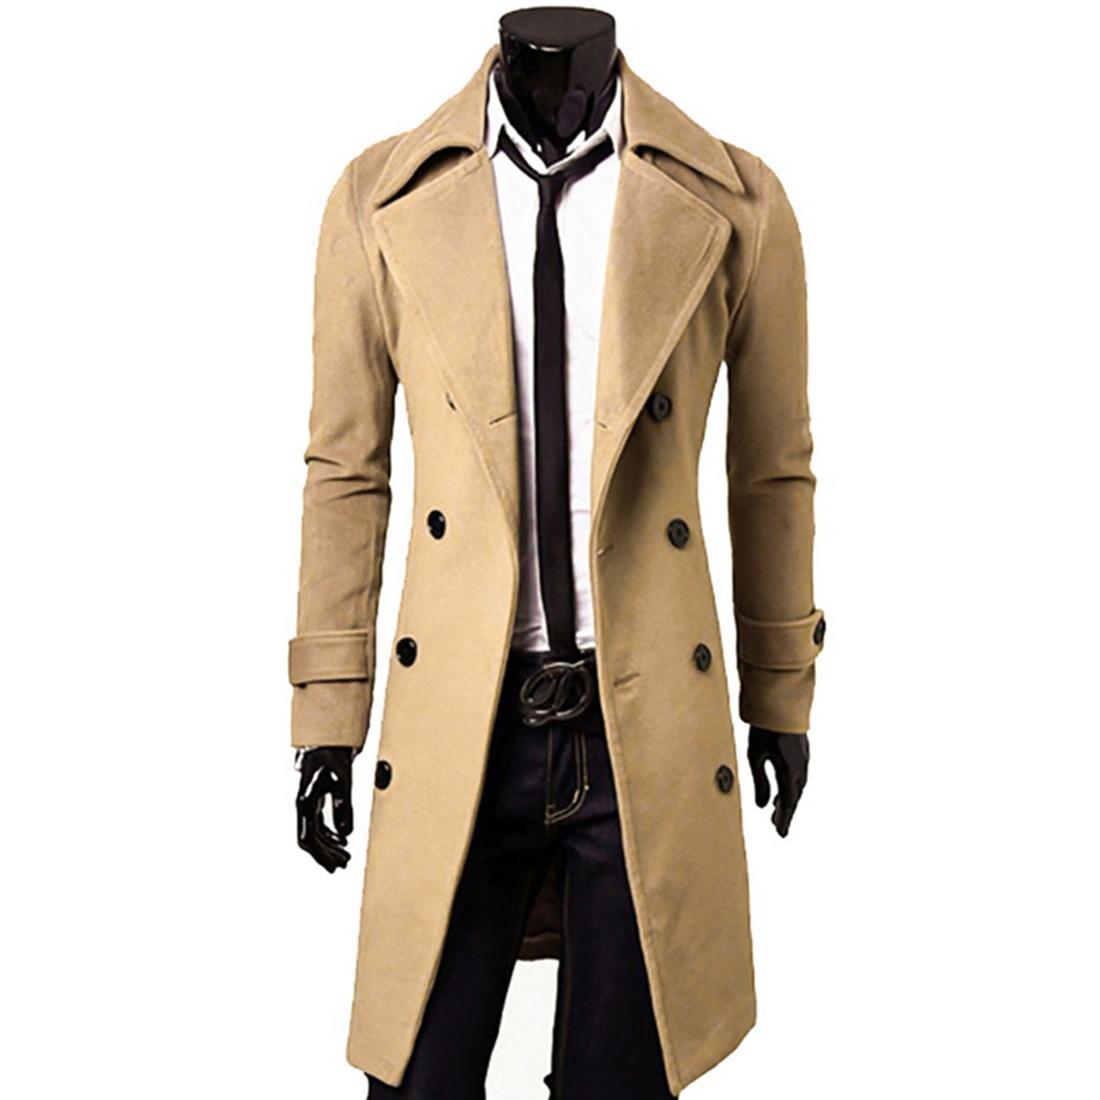 Adisputent 2020 New Autumn Winter Men's Trench Coat Long Sleeve Solid Color Cool Mens Long Coat Cotton Male Overcoat Size M-3XL